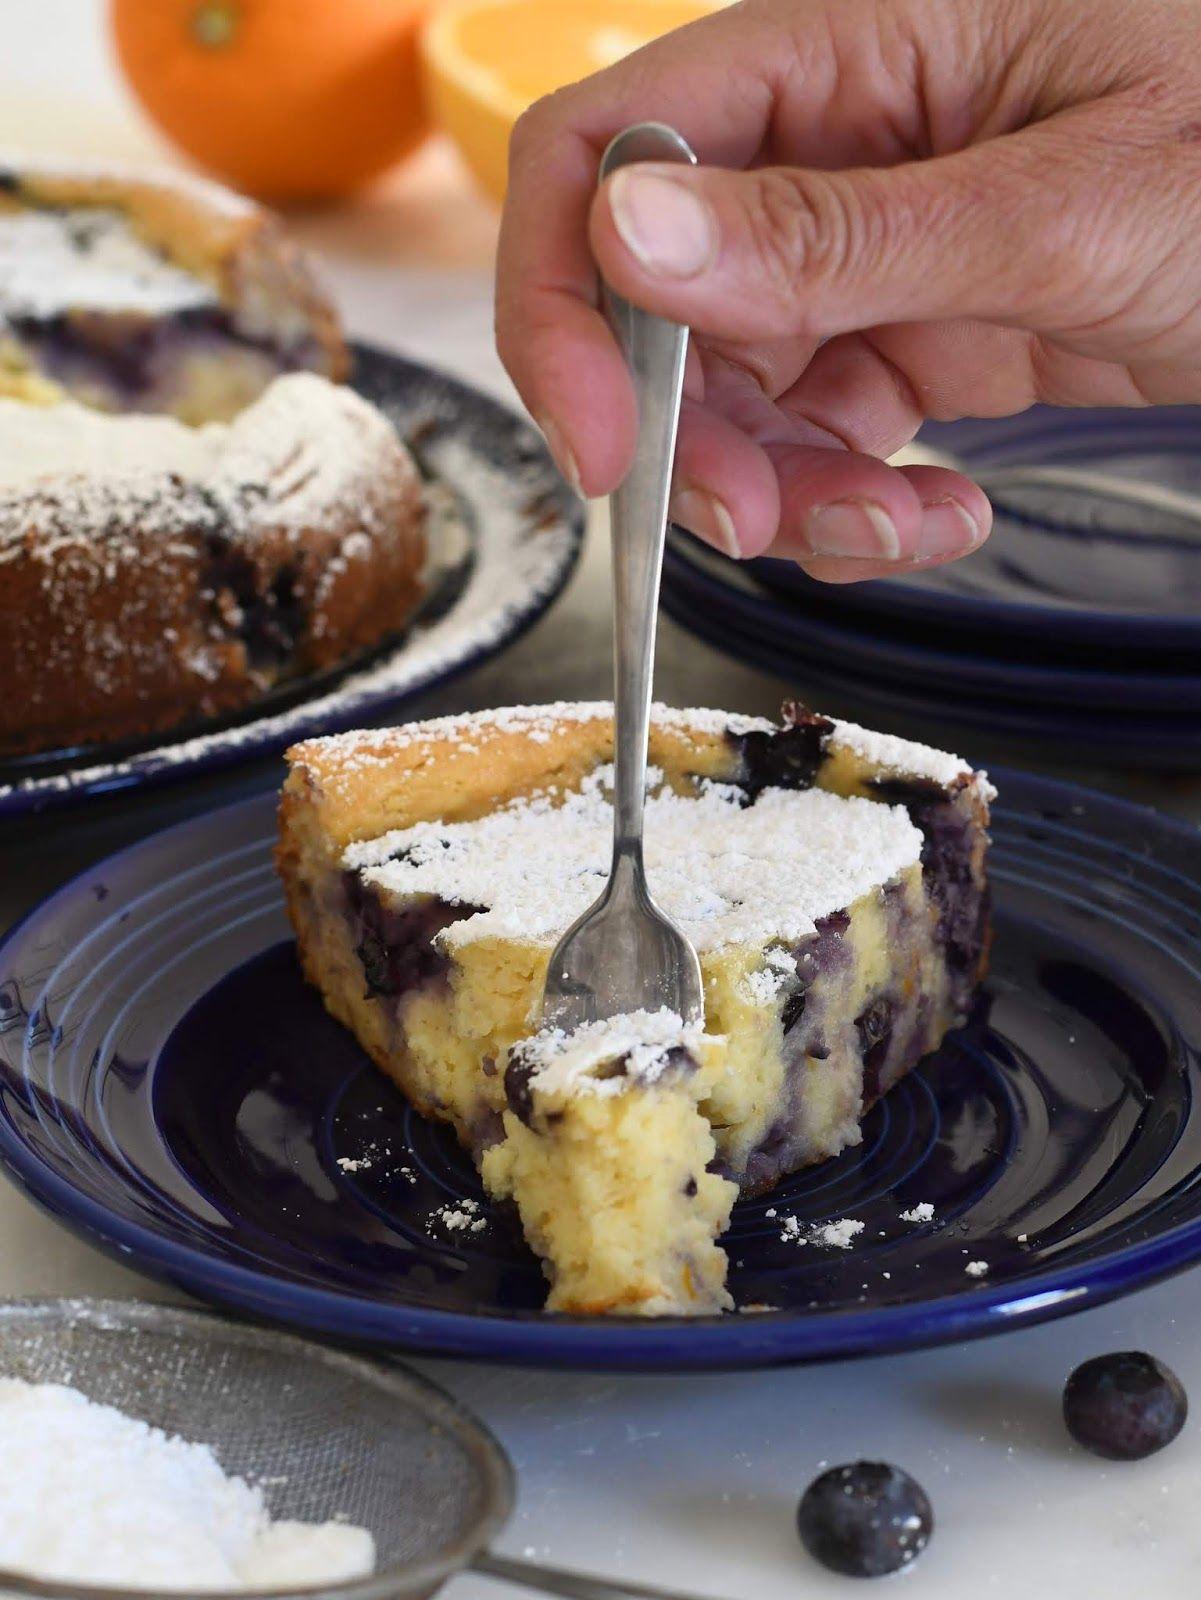 Italian Ricotta Cheese Cake With Blueberries Ricotta Recipes Dessert Ricotta Cheese Ricotta Cheese Desserts